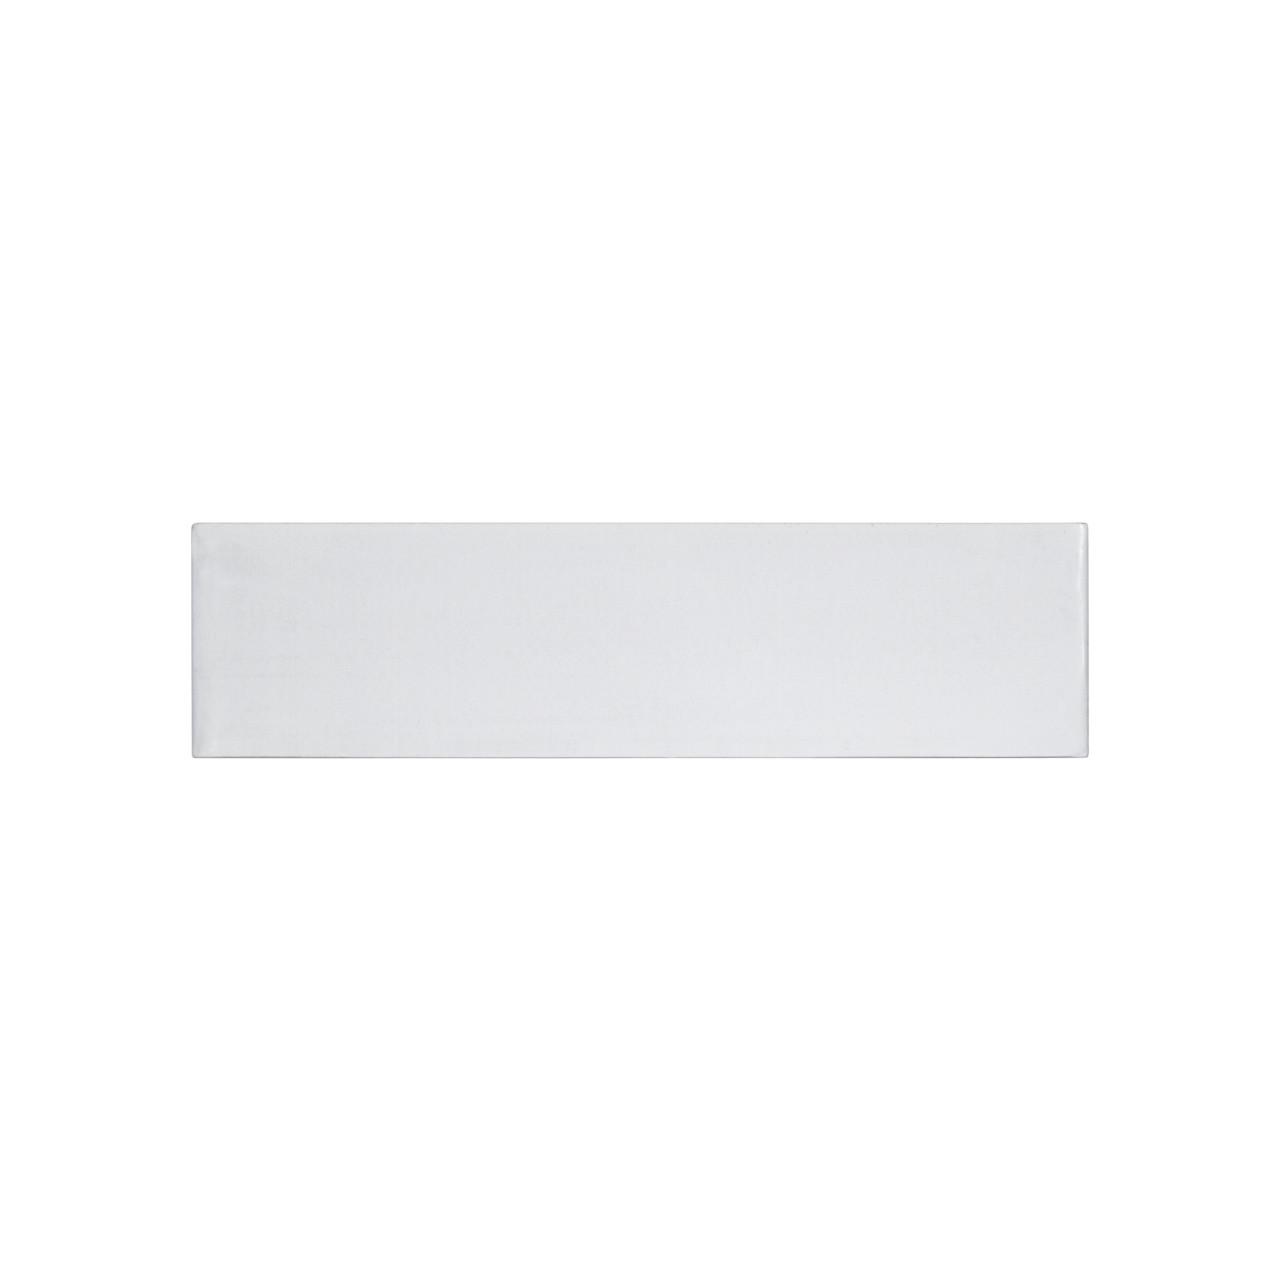 Vulcan RFID Printable Metal Mount Label - 100 Tags (70 x 18 mm) [Clearance]